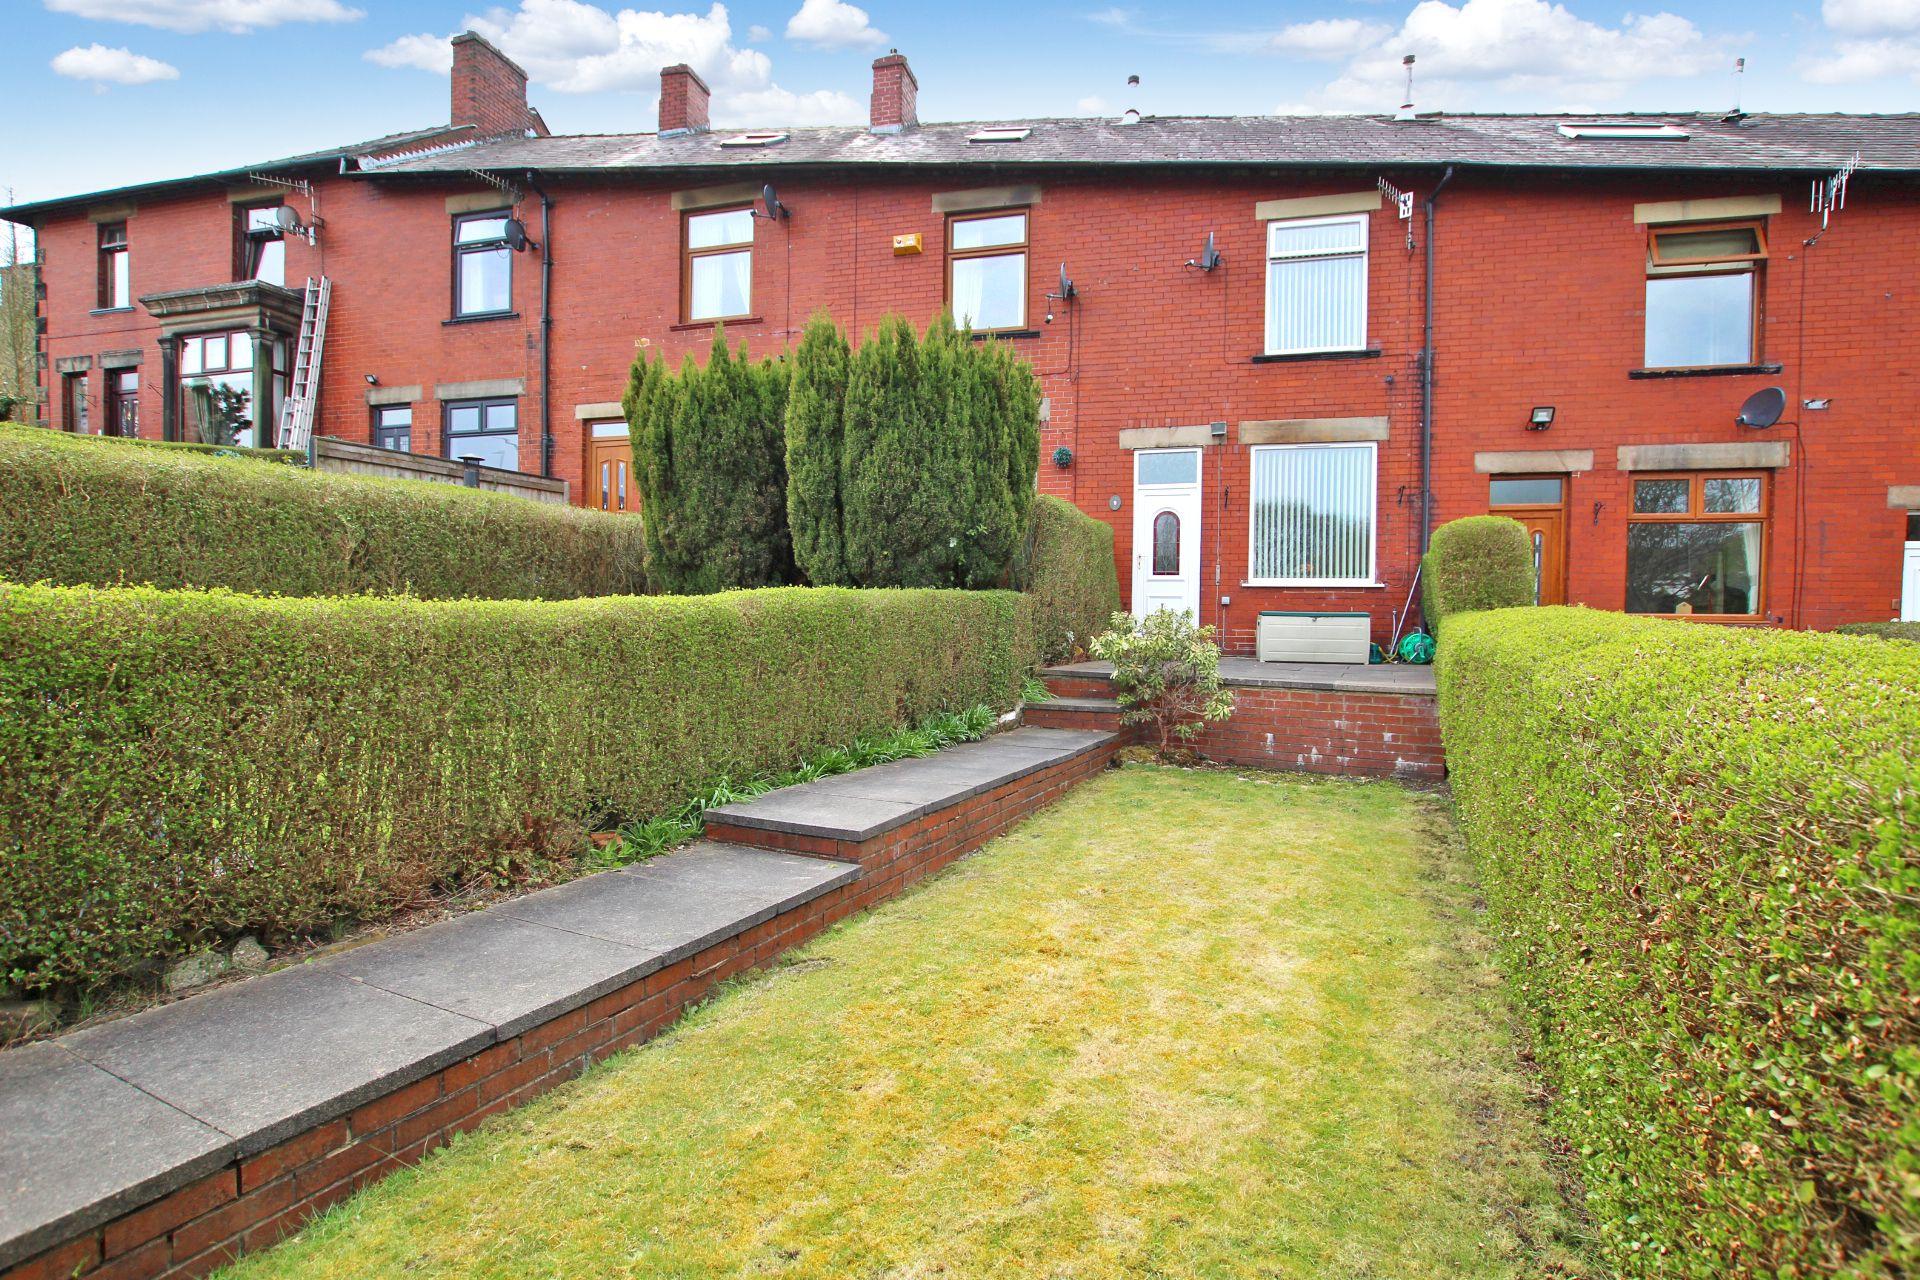 Property photo 1 of 13.